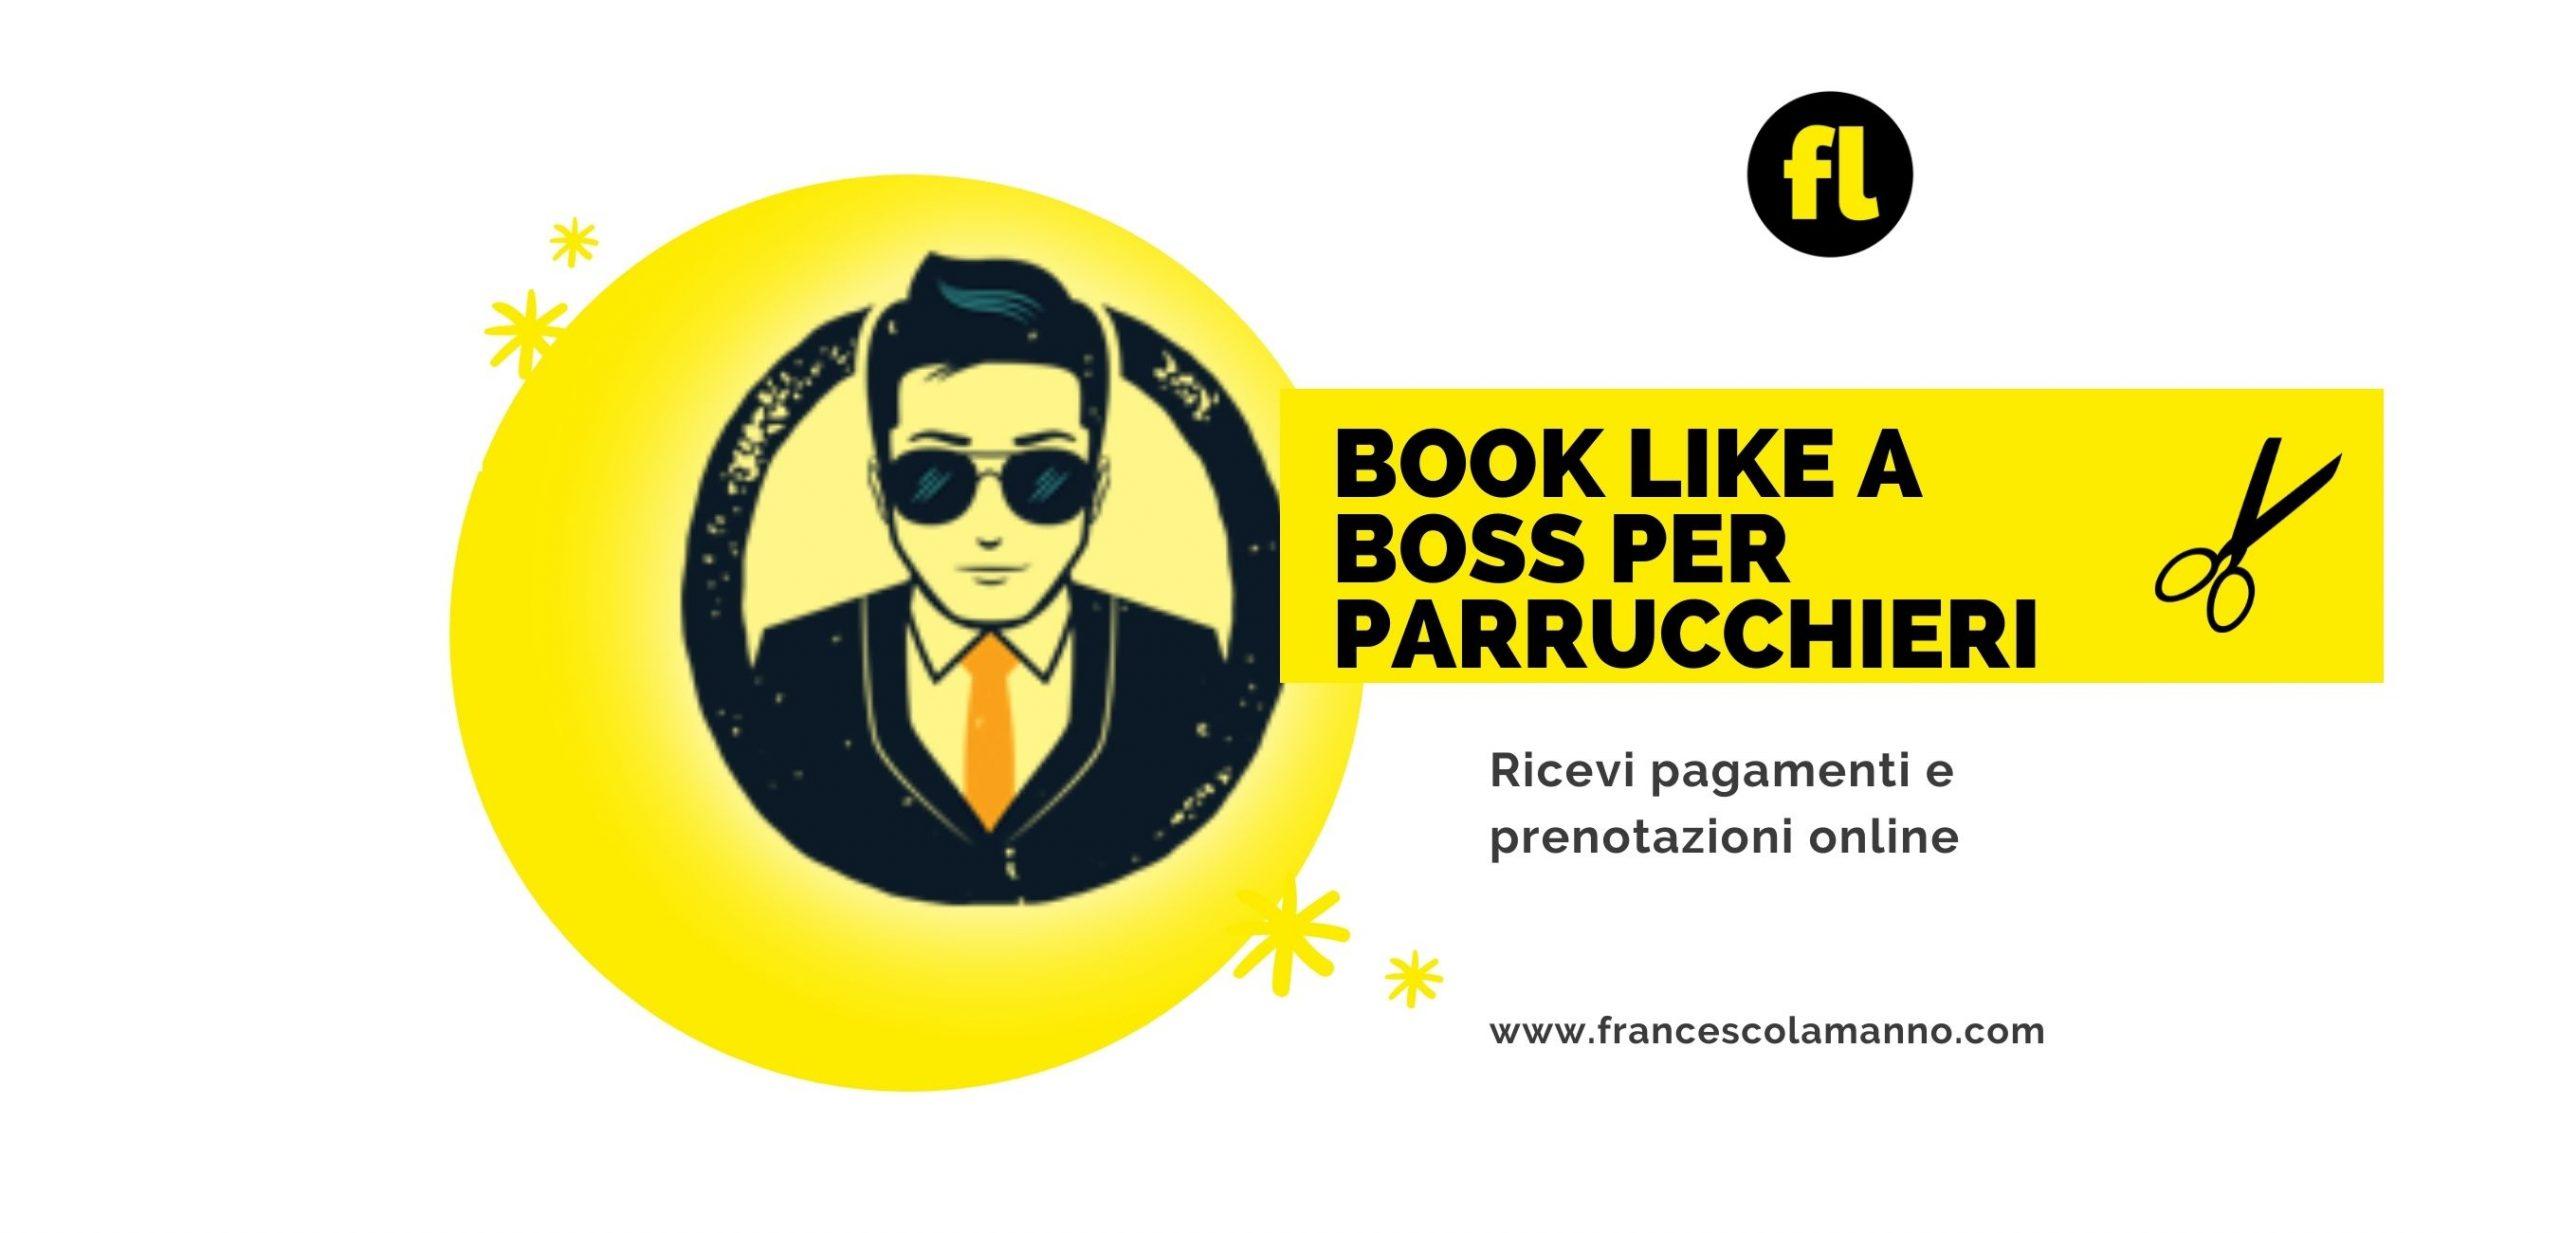 Book like a Boss per parrucchieri